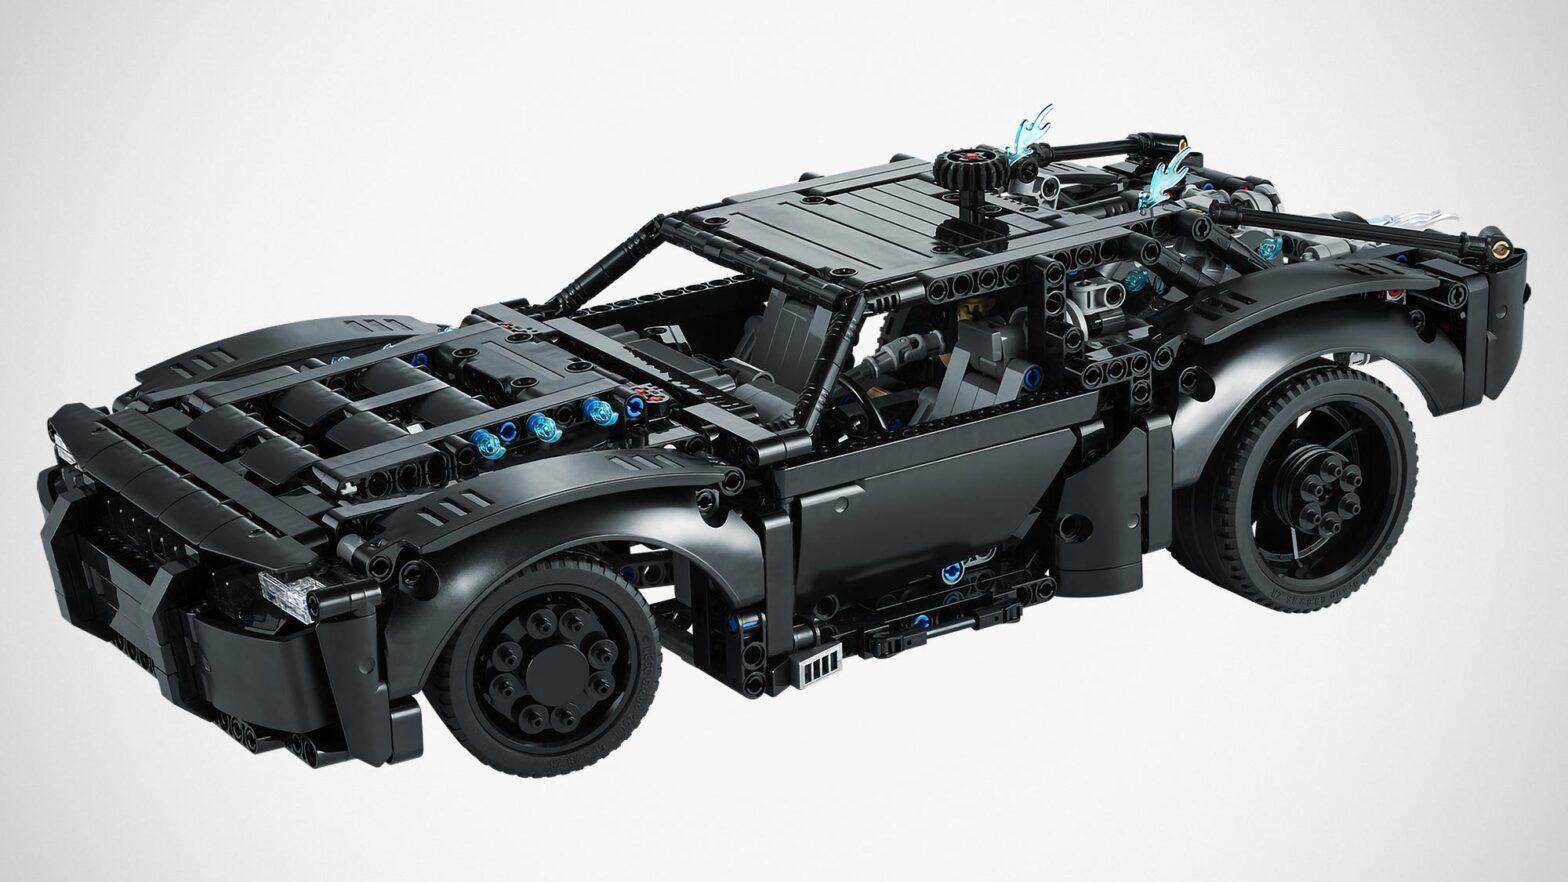 LEGO 1360 Technic The Batman Batmobile Set